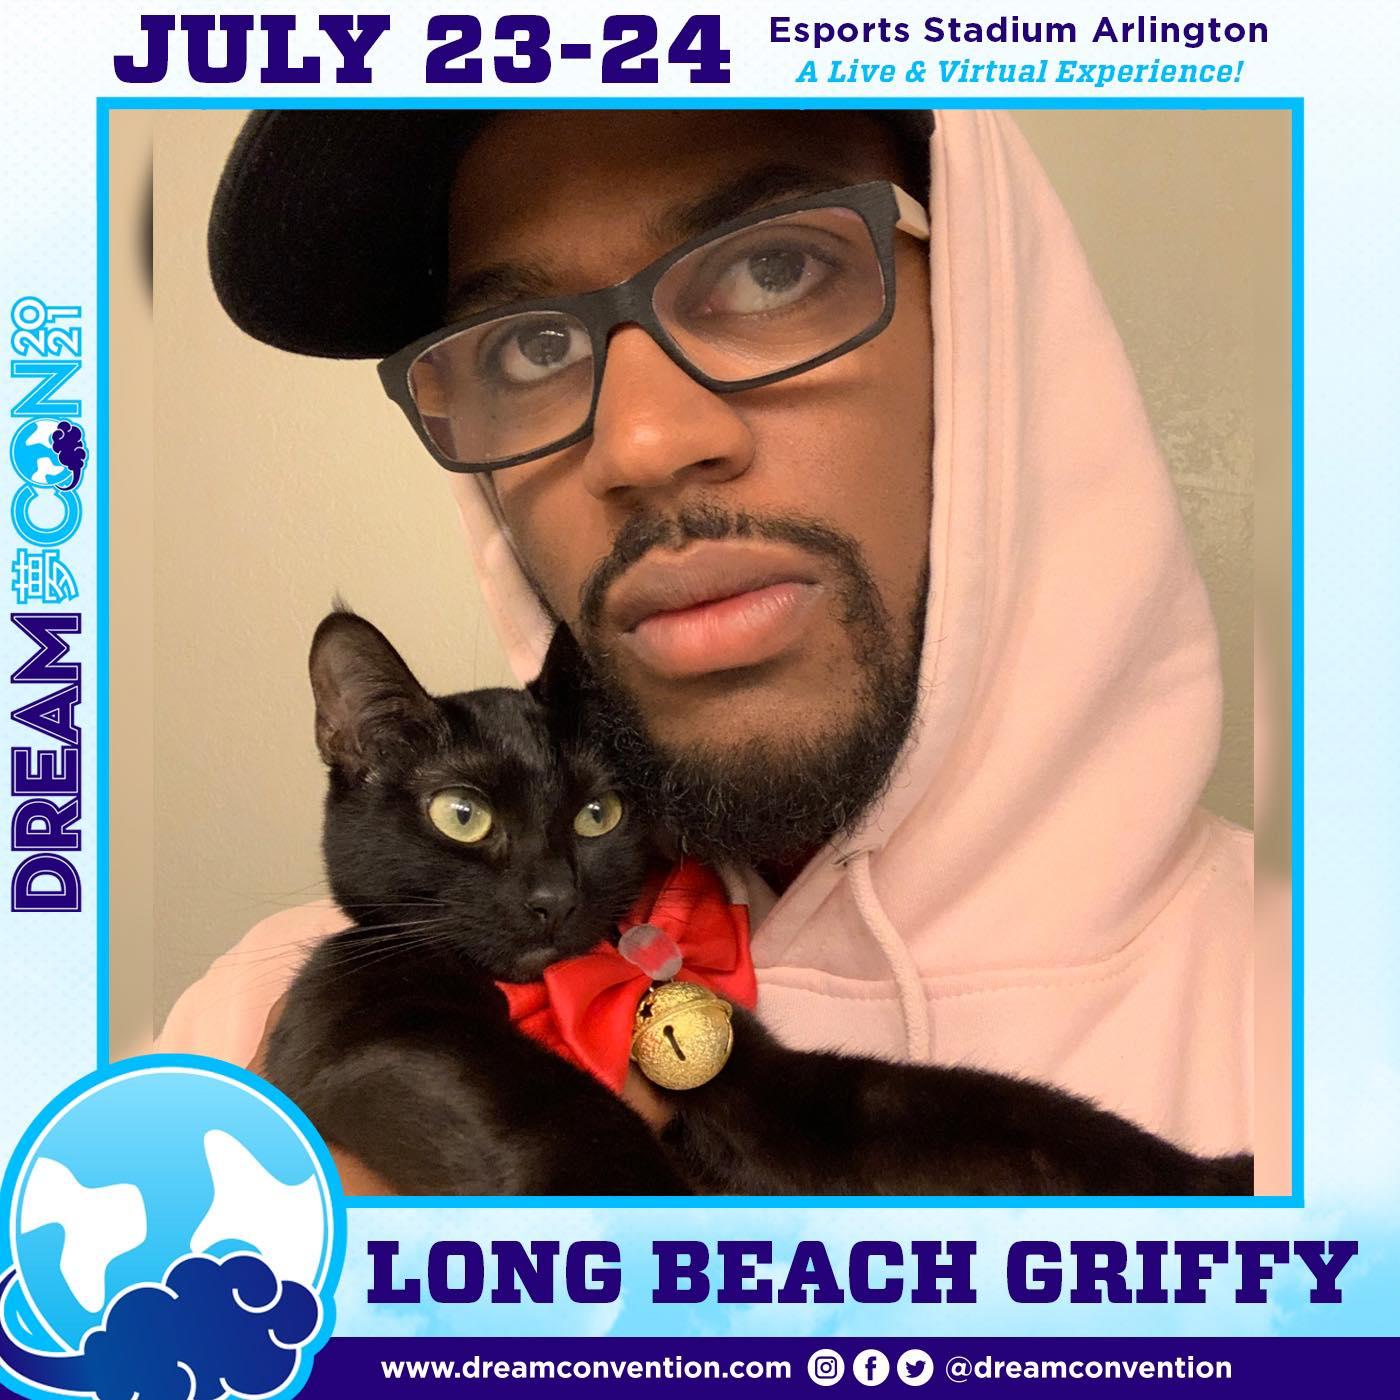 Long Beach Griffy